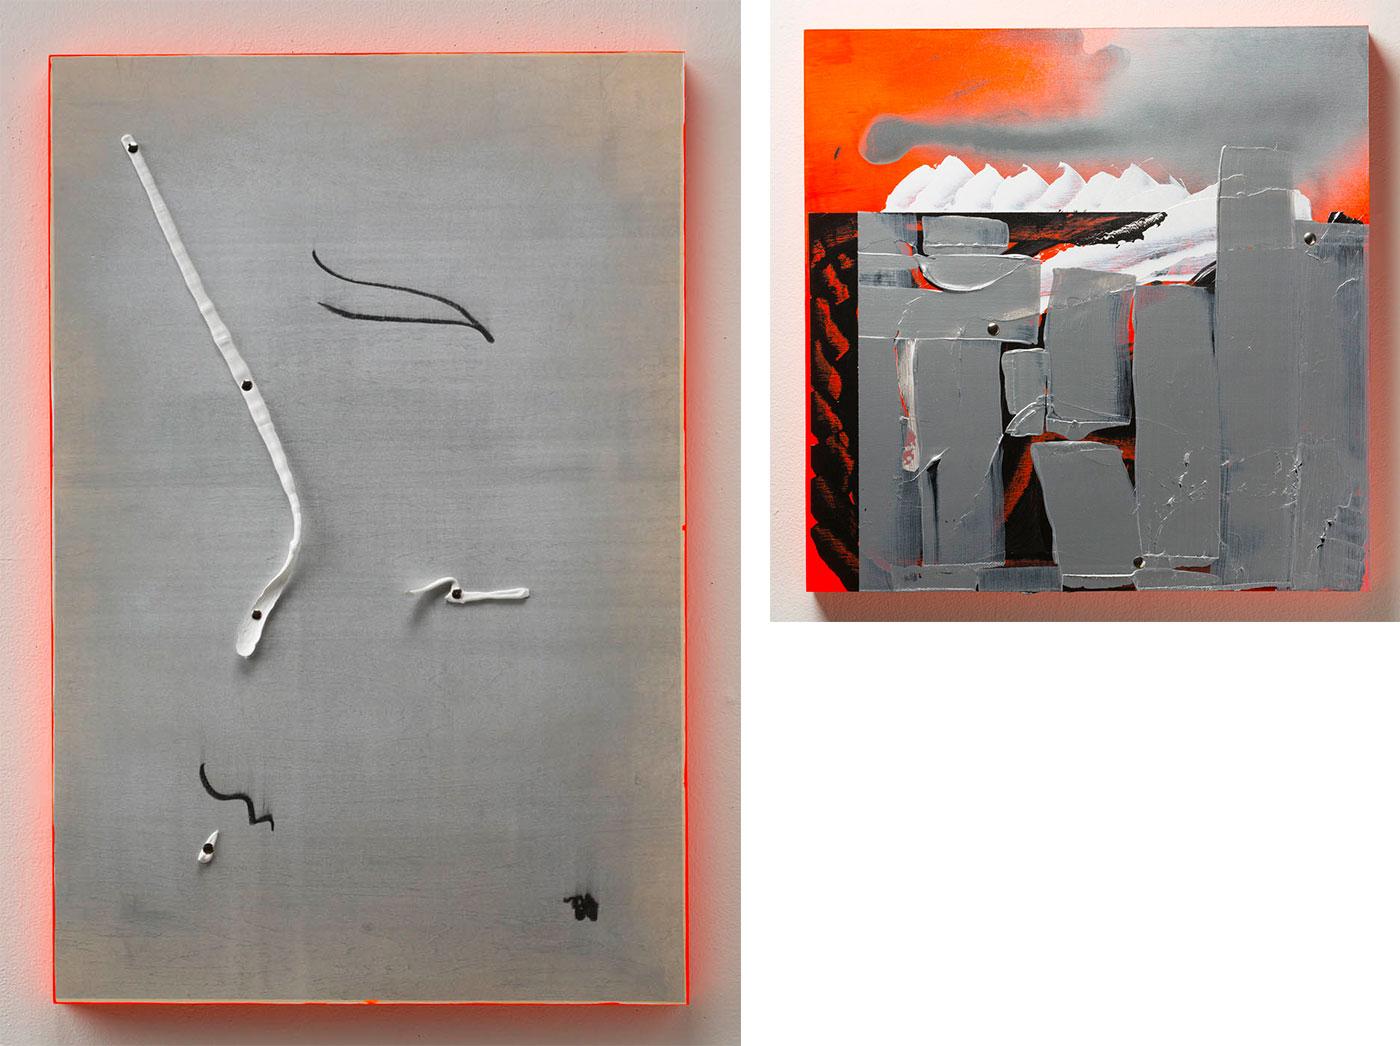 Christian J. Morin - Still Life and Landscape (Diptych)